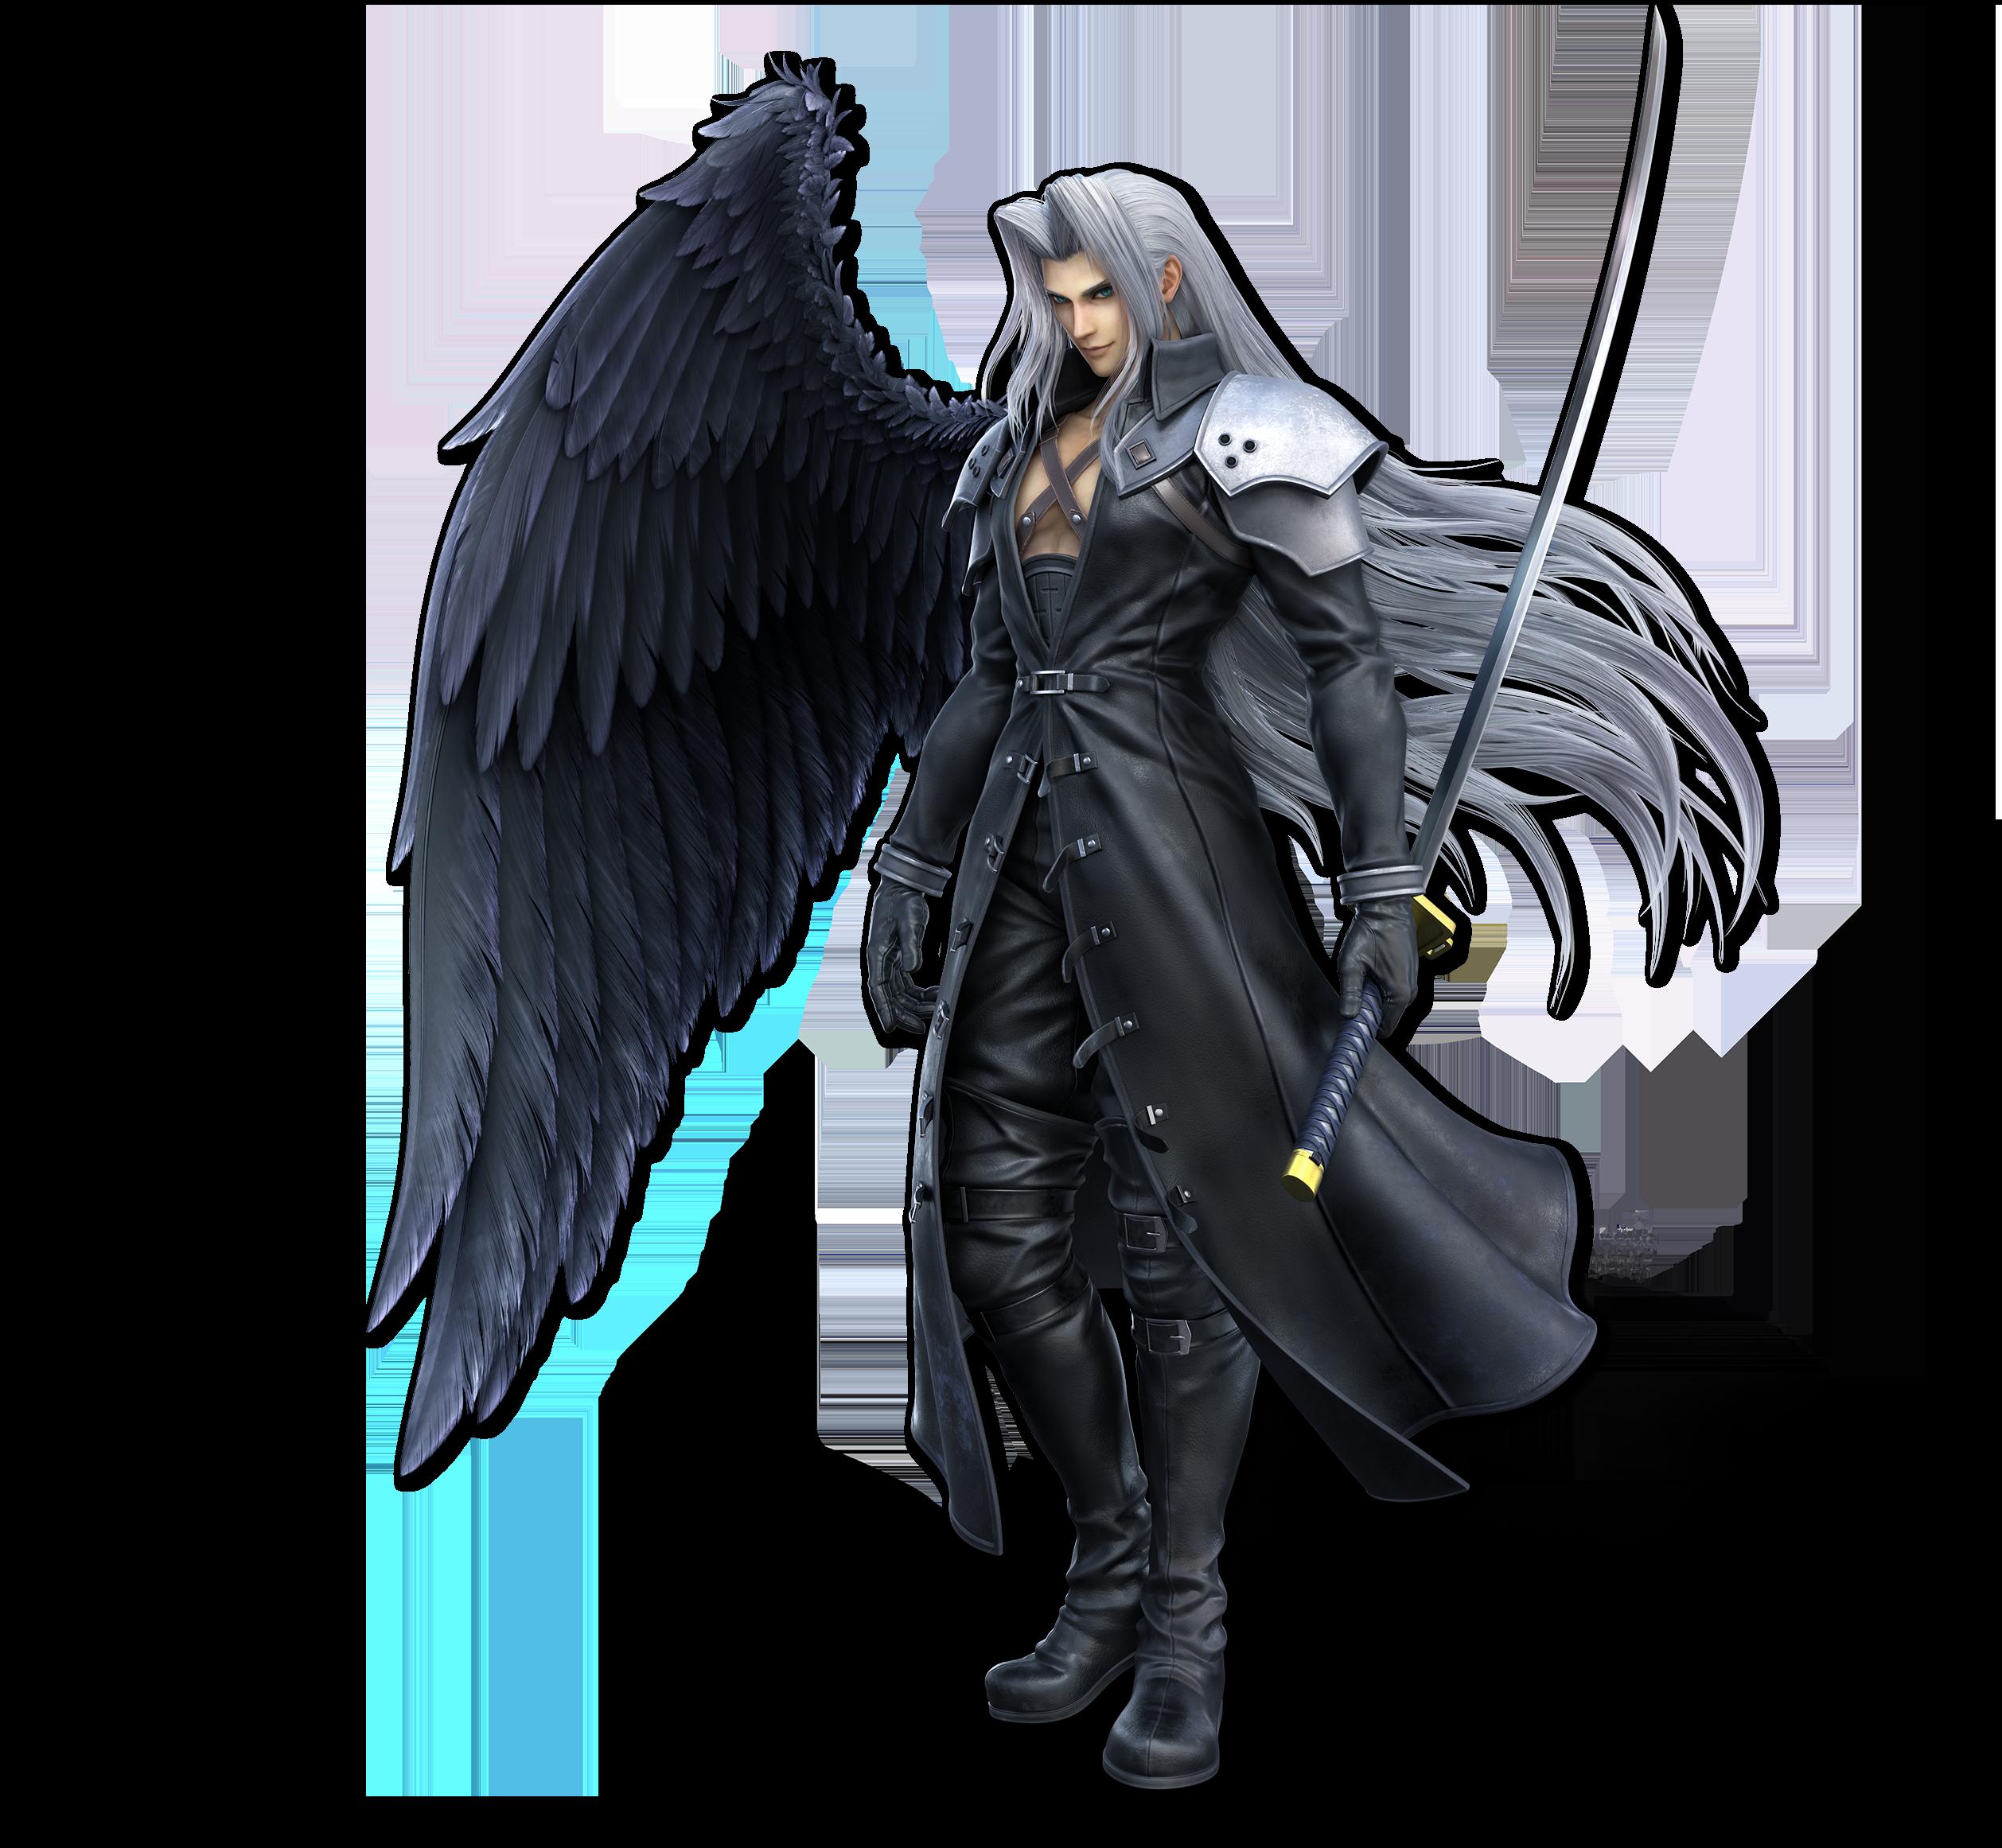 Ssbu Sephiroth Render Personajes De Videojuegos Smash Bros Super Smash Bros